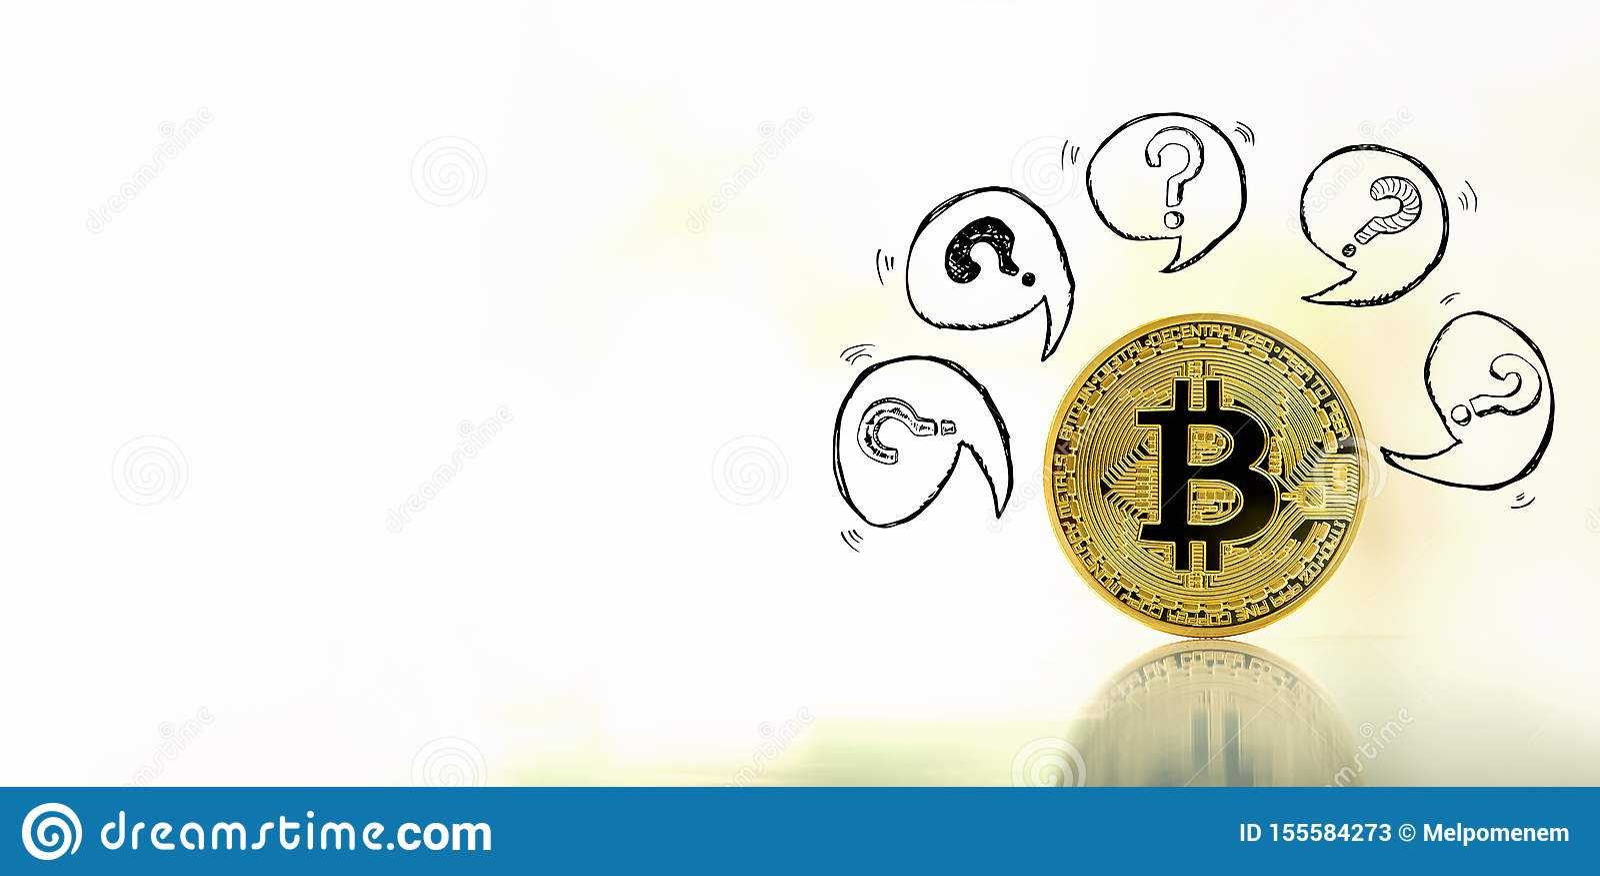 Bitcoinstock informative speech betting arena atlantica analyzer technician